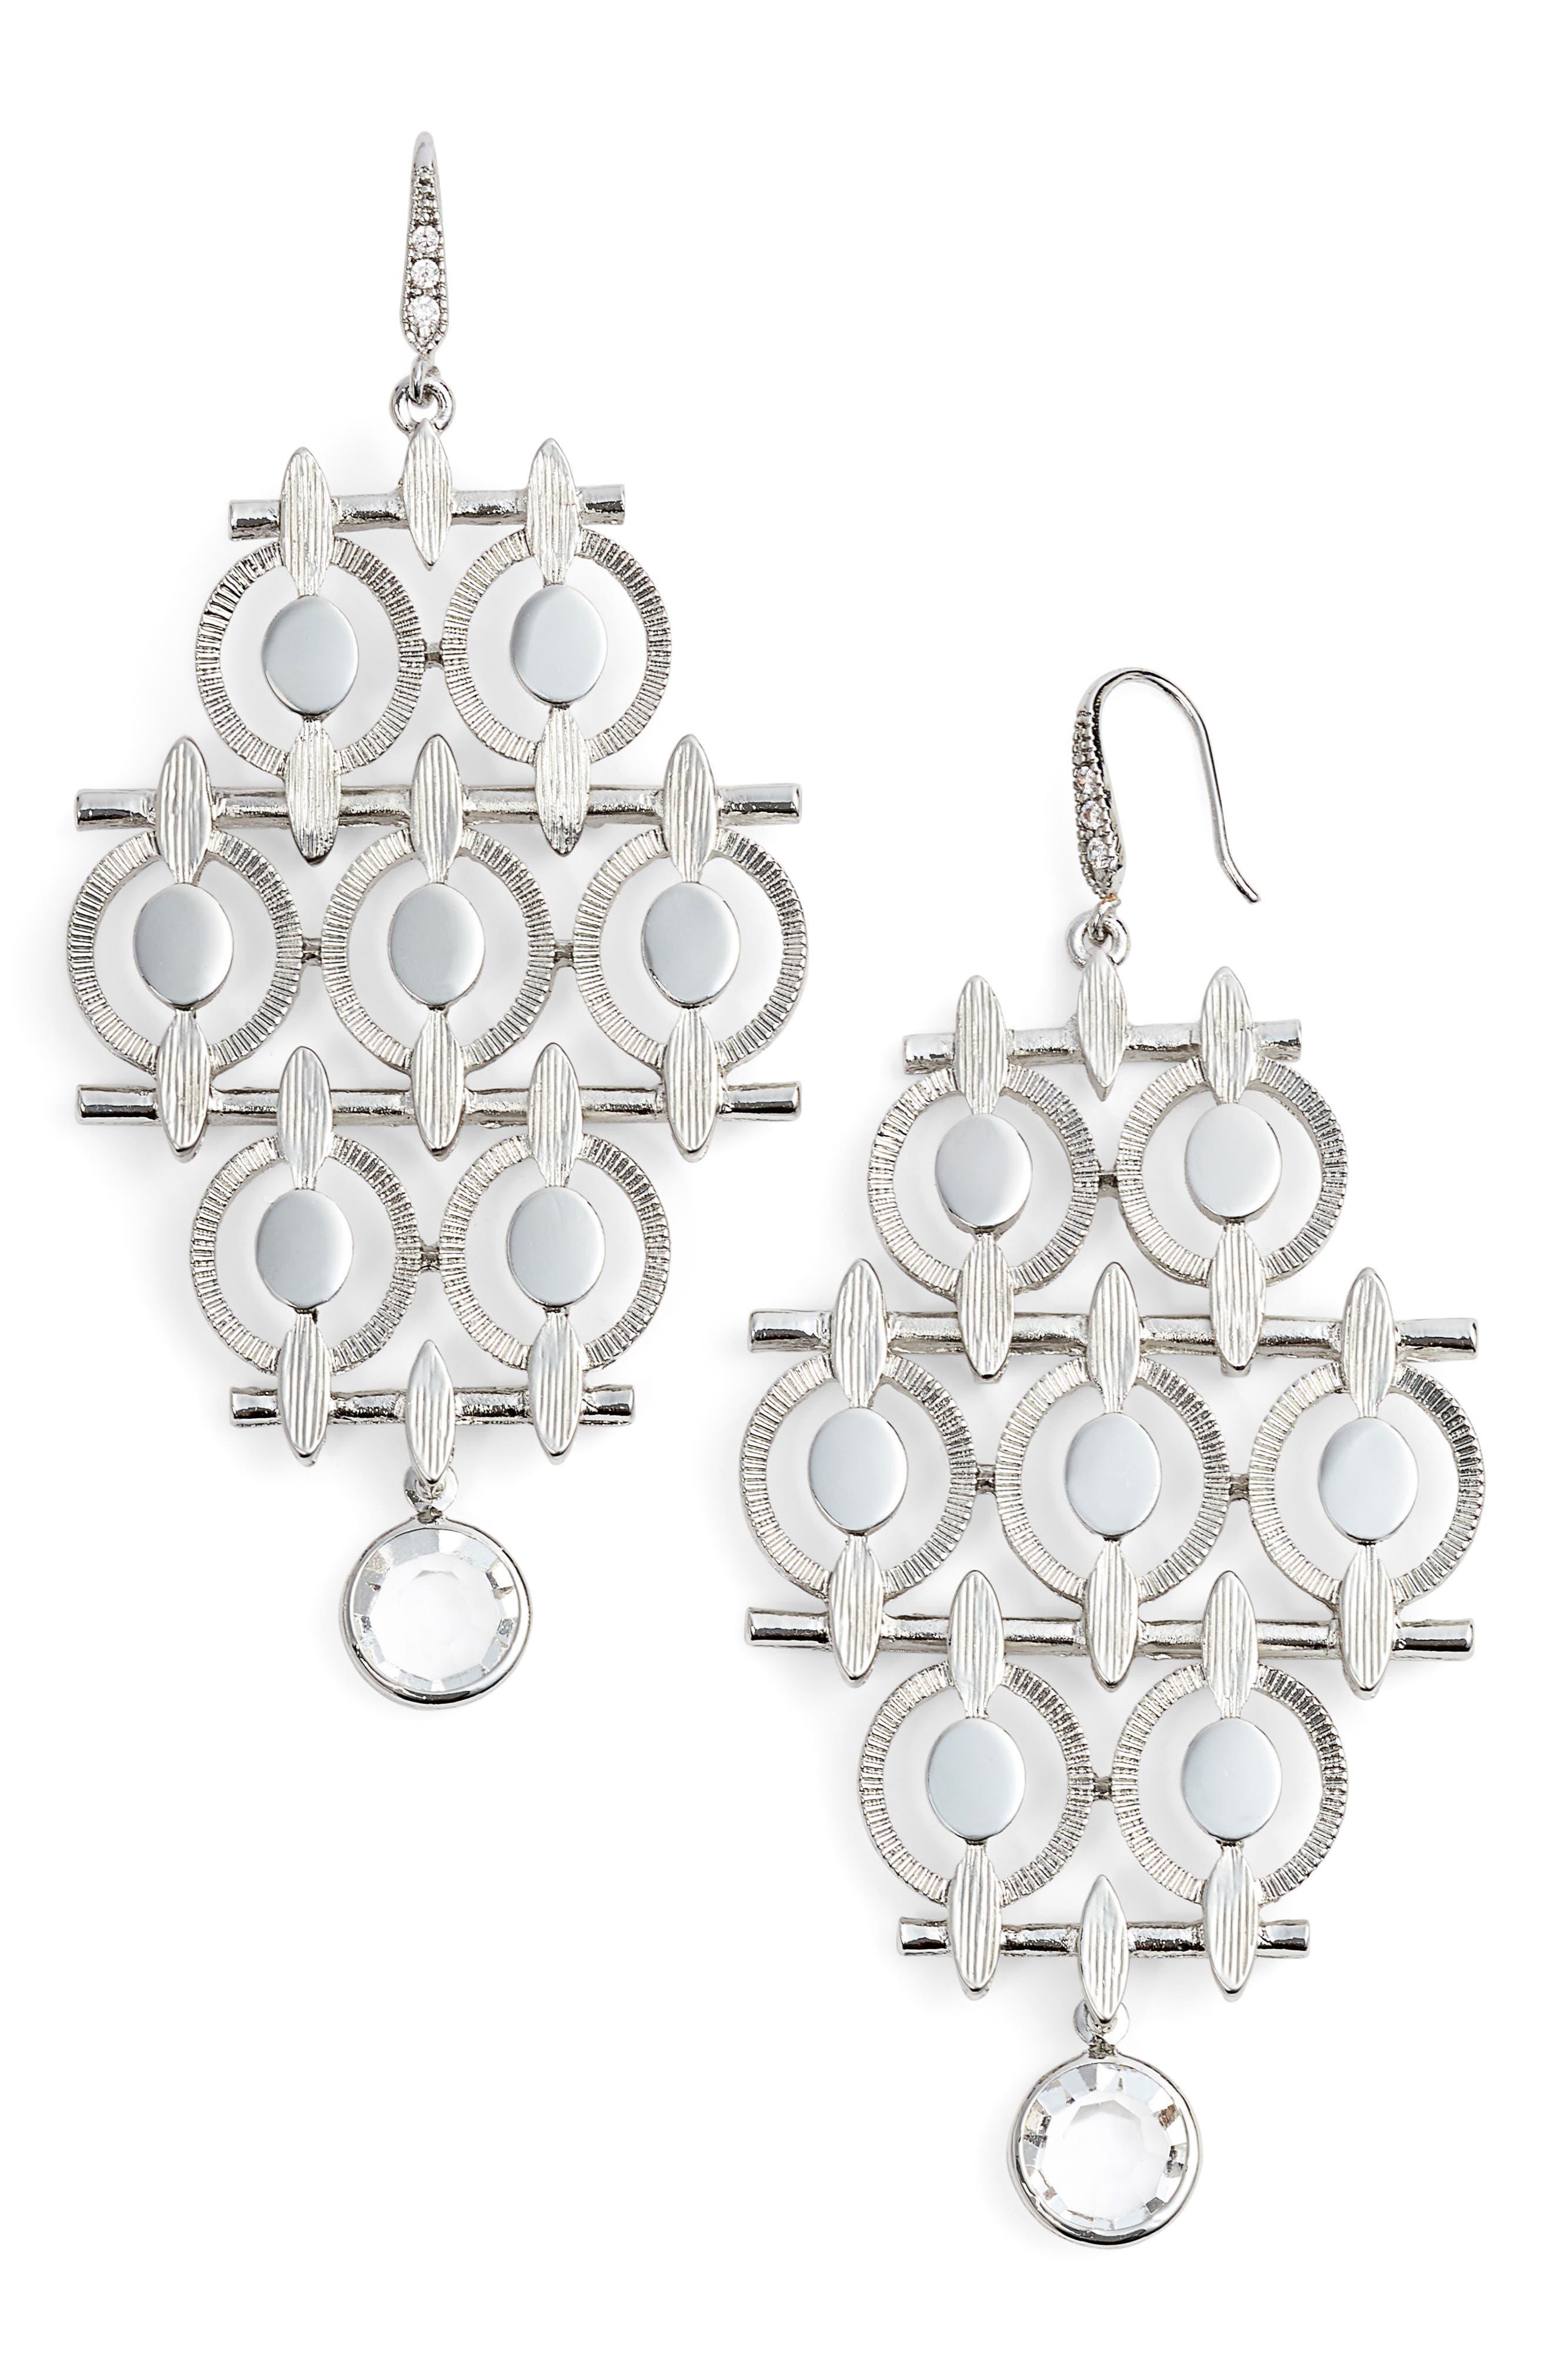 Main Image - Badgley Mischka Chandelier Drop Earrings